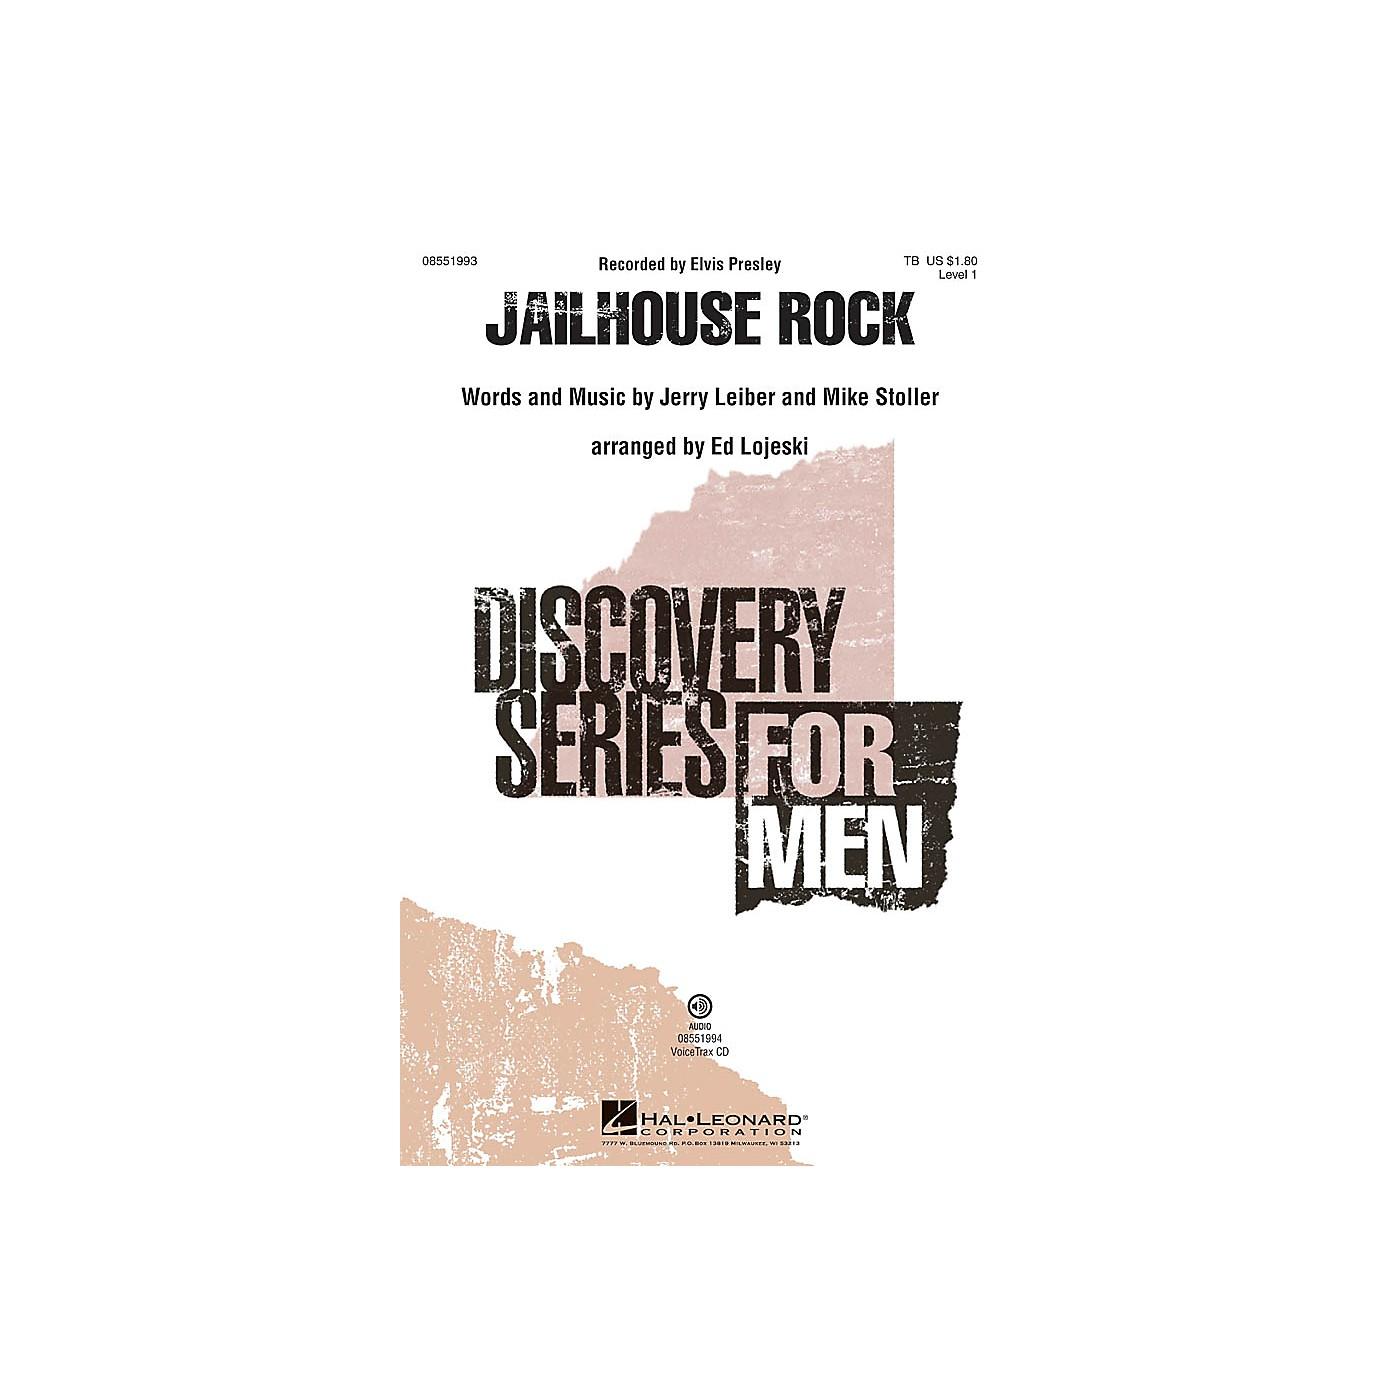 Hal Leonard Jailhouse Rock (Discovery Level 1) TB arranged by Ed Lojeski thumbnail